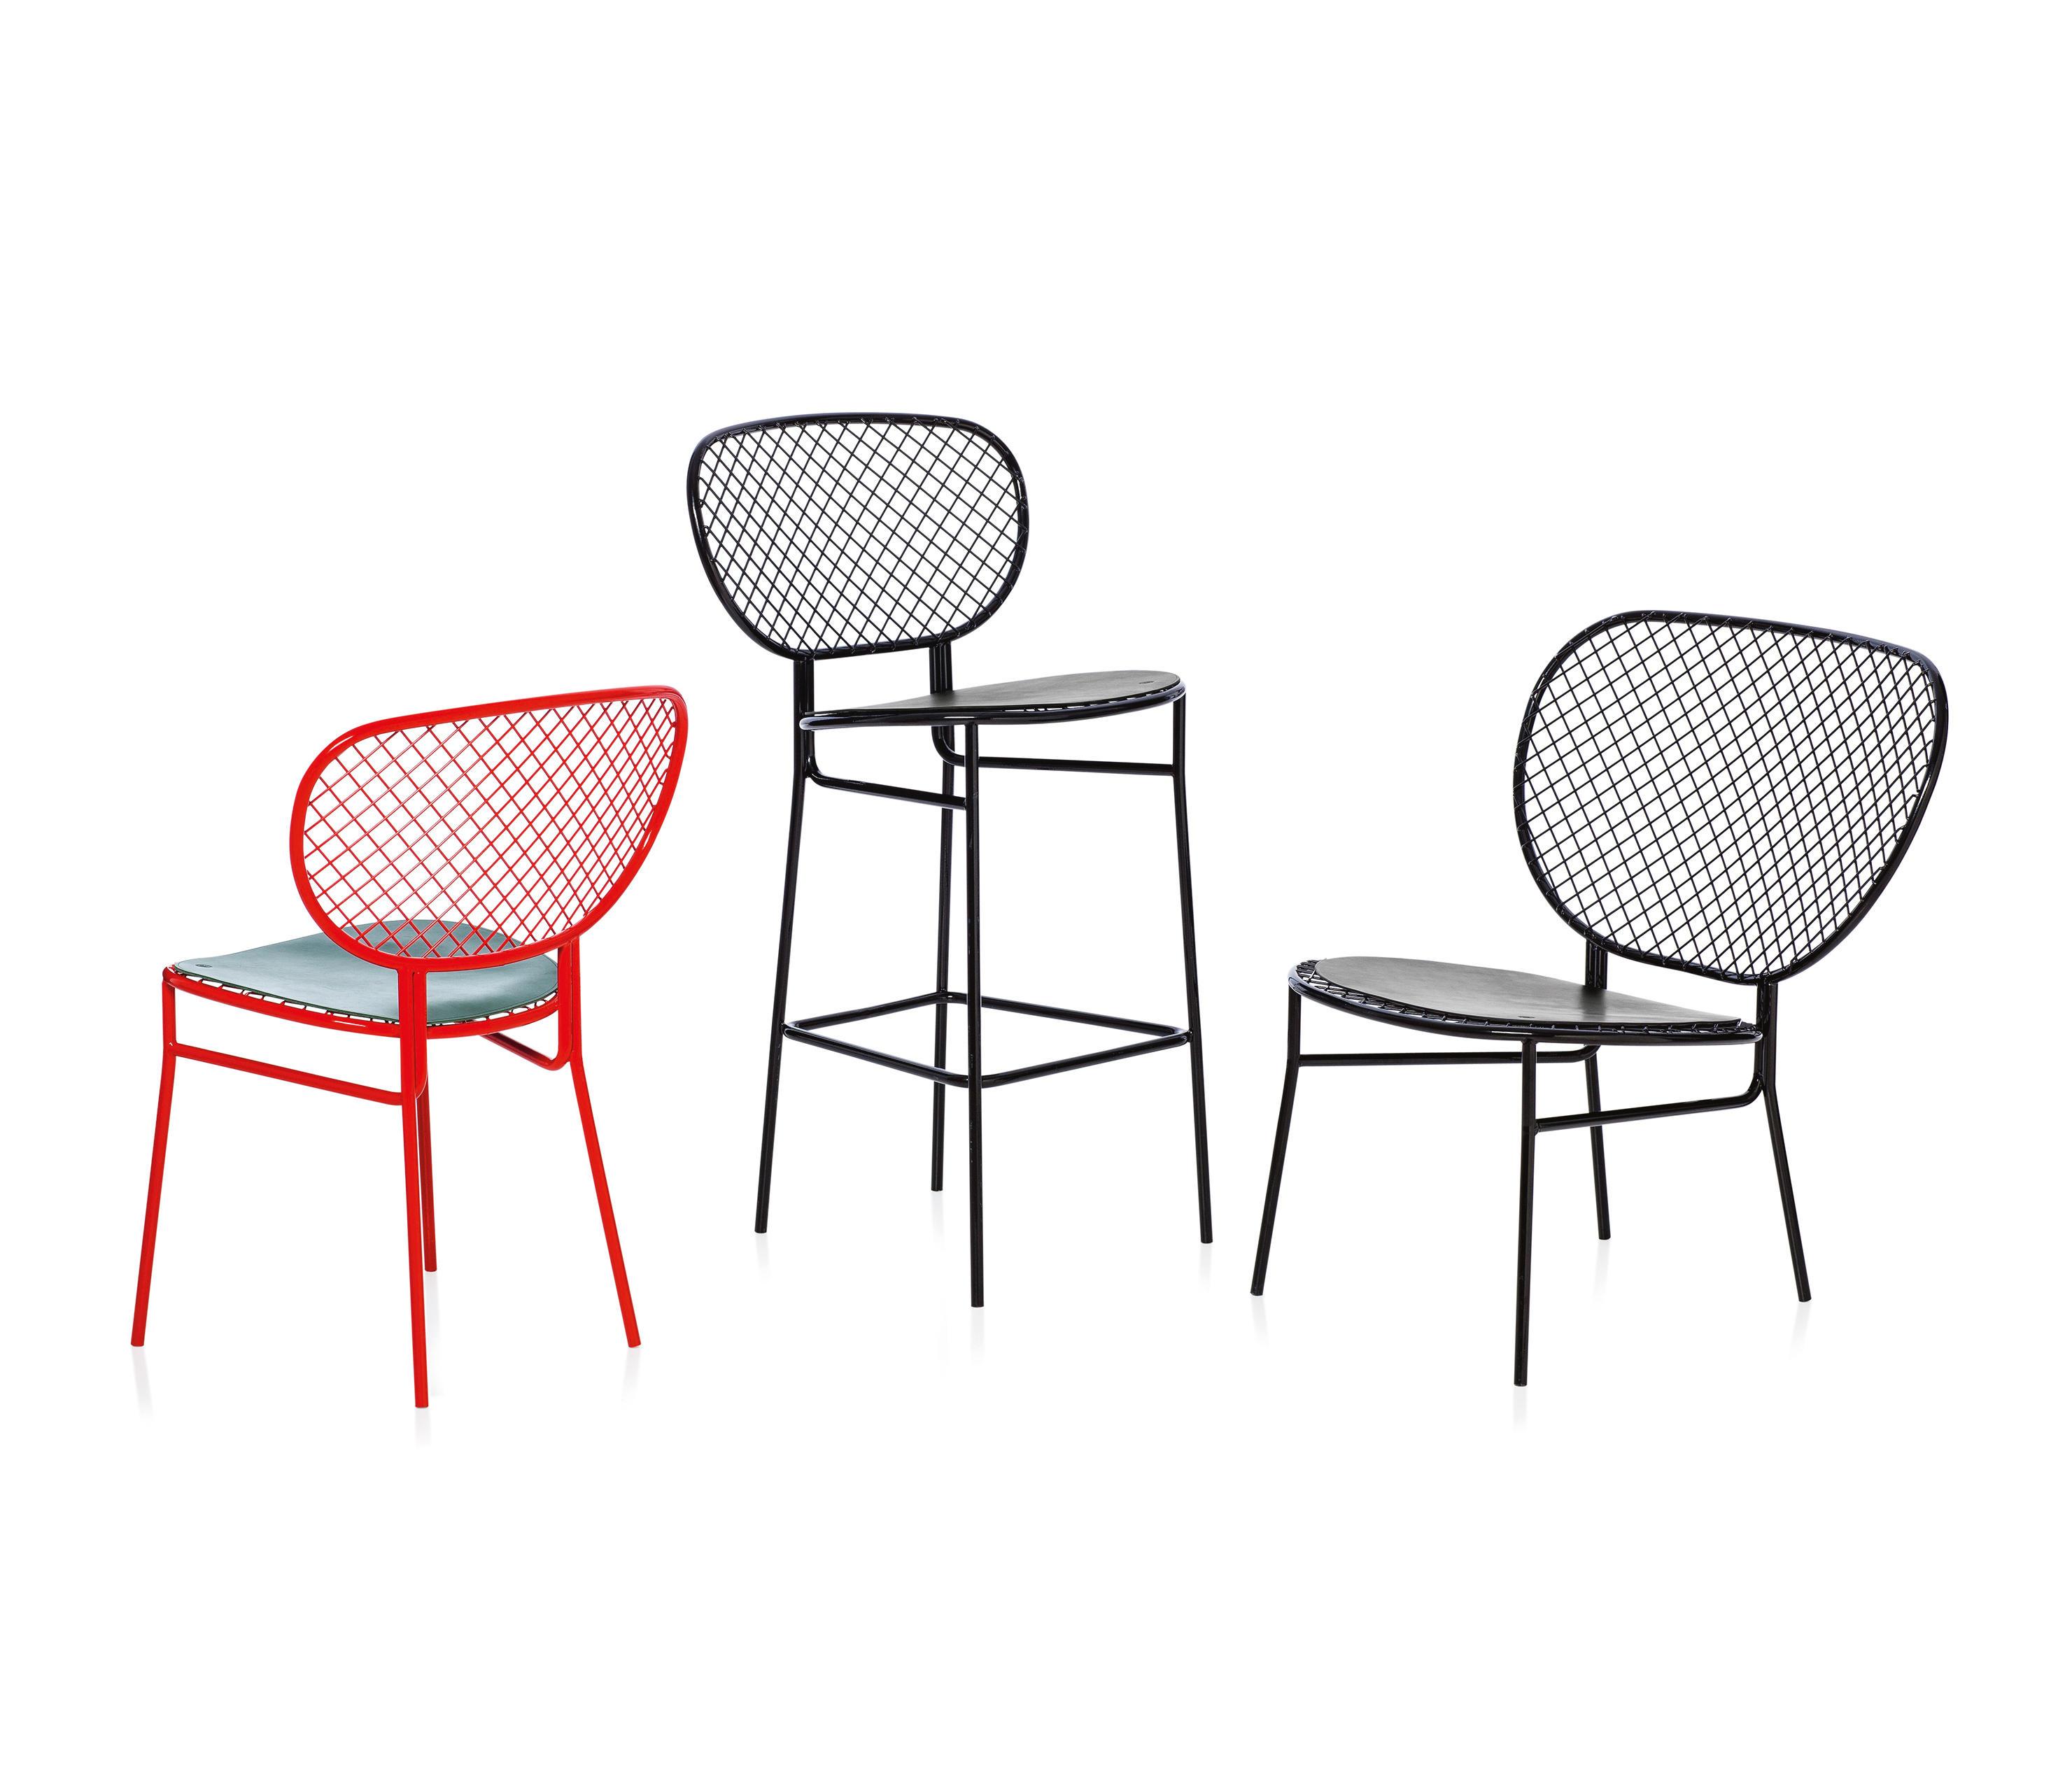 Wimbledon Chair Amp Designer Furniture Architonic